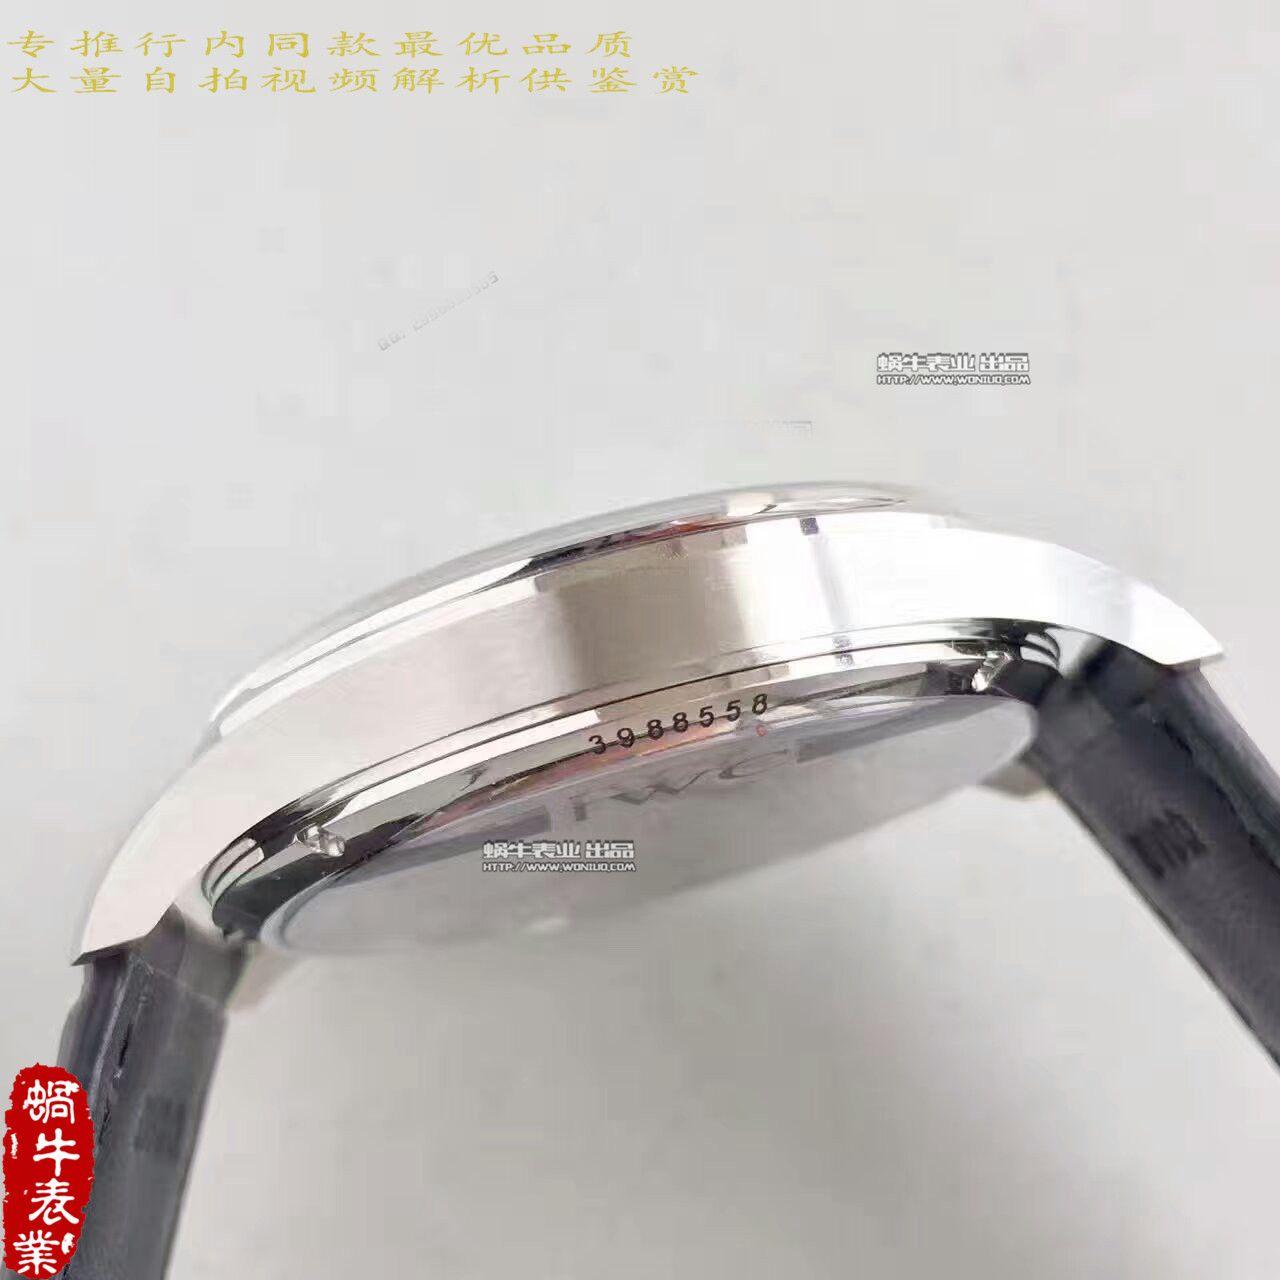 【YL厂一比一超A高仿手表】万国葡萄牙三针一线系列琼斯之剑IW544401腕表 / WG306